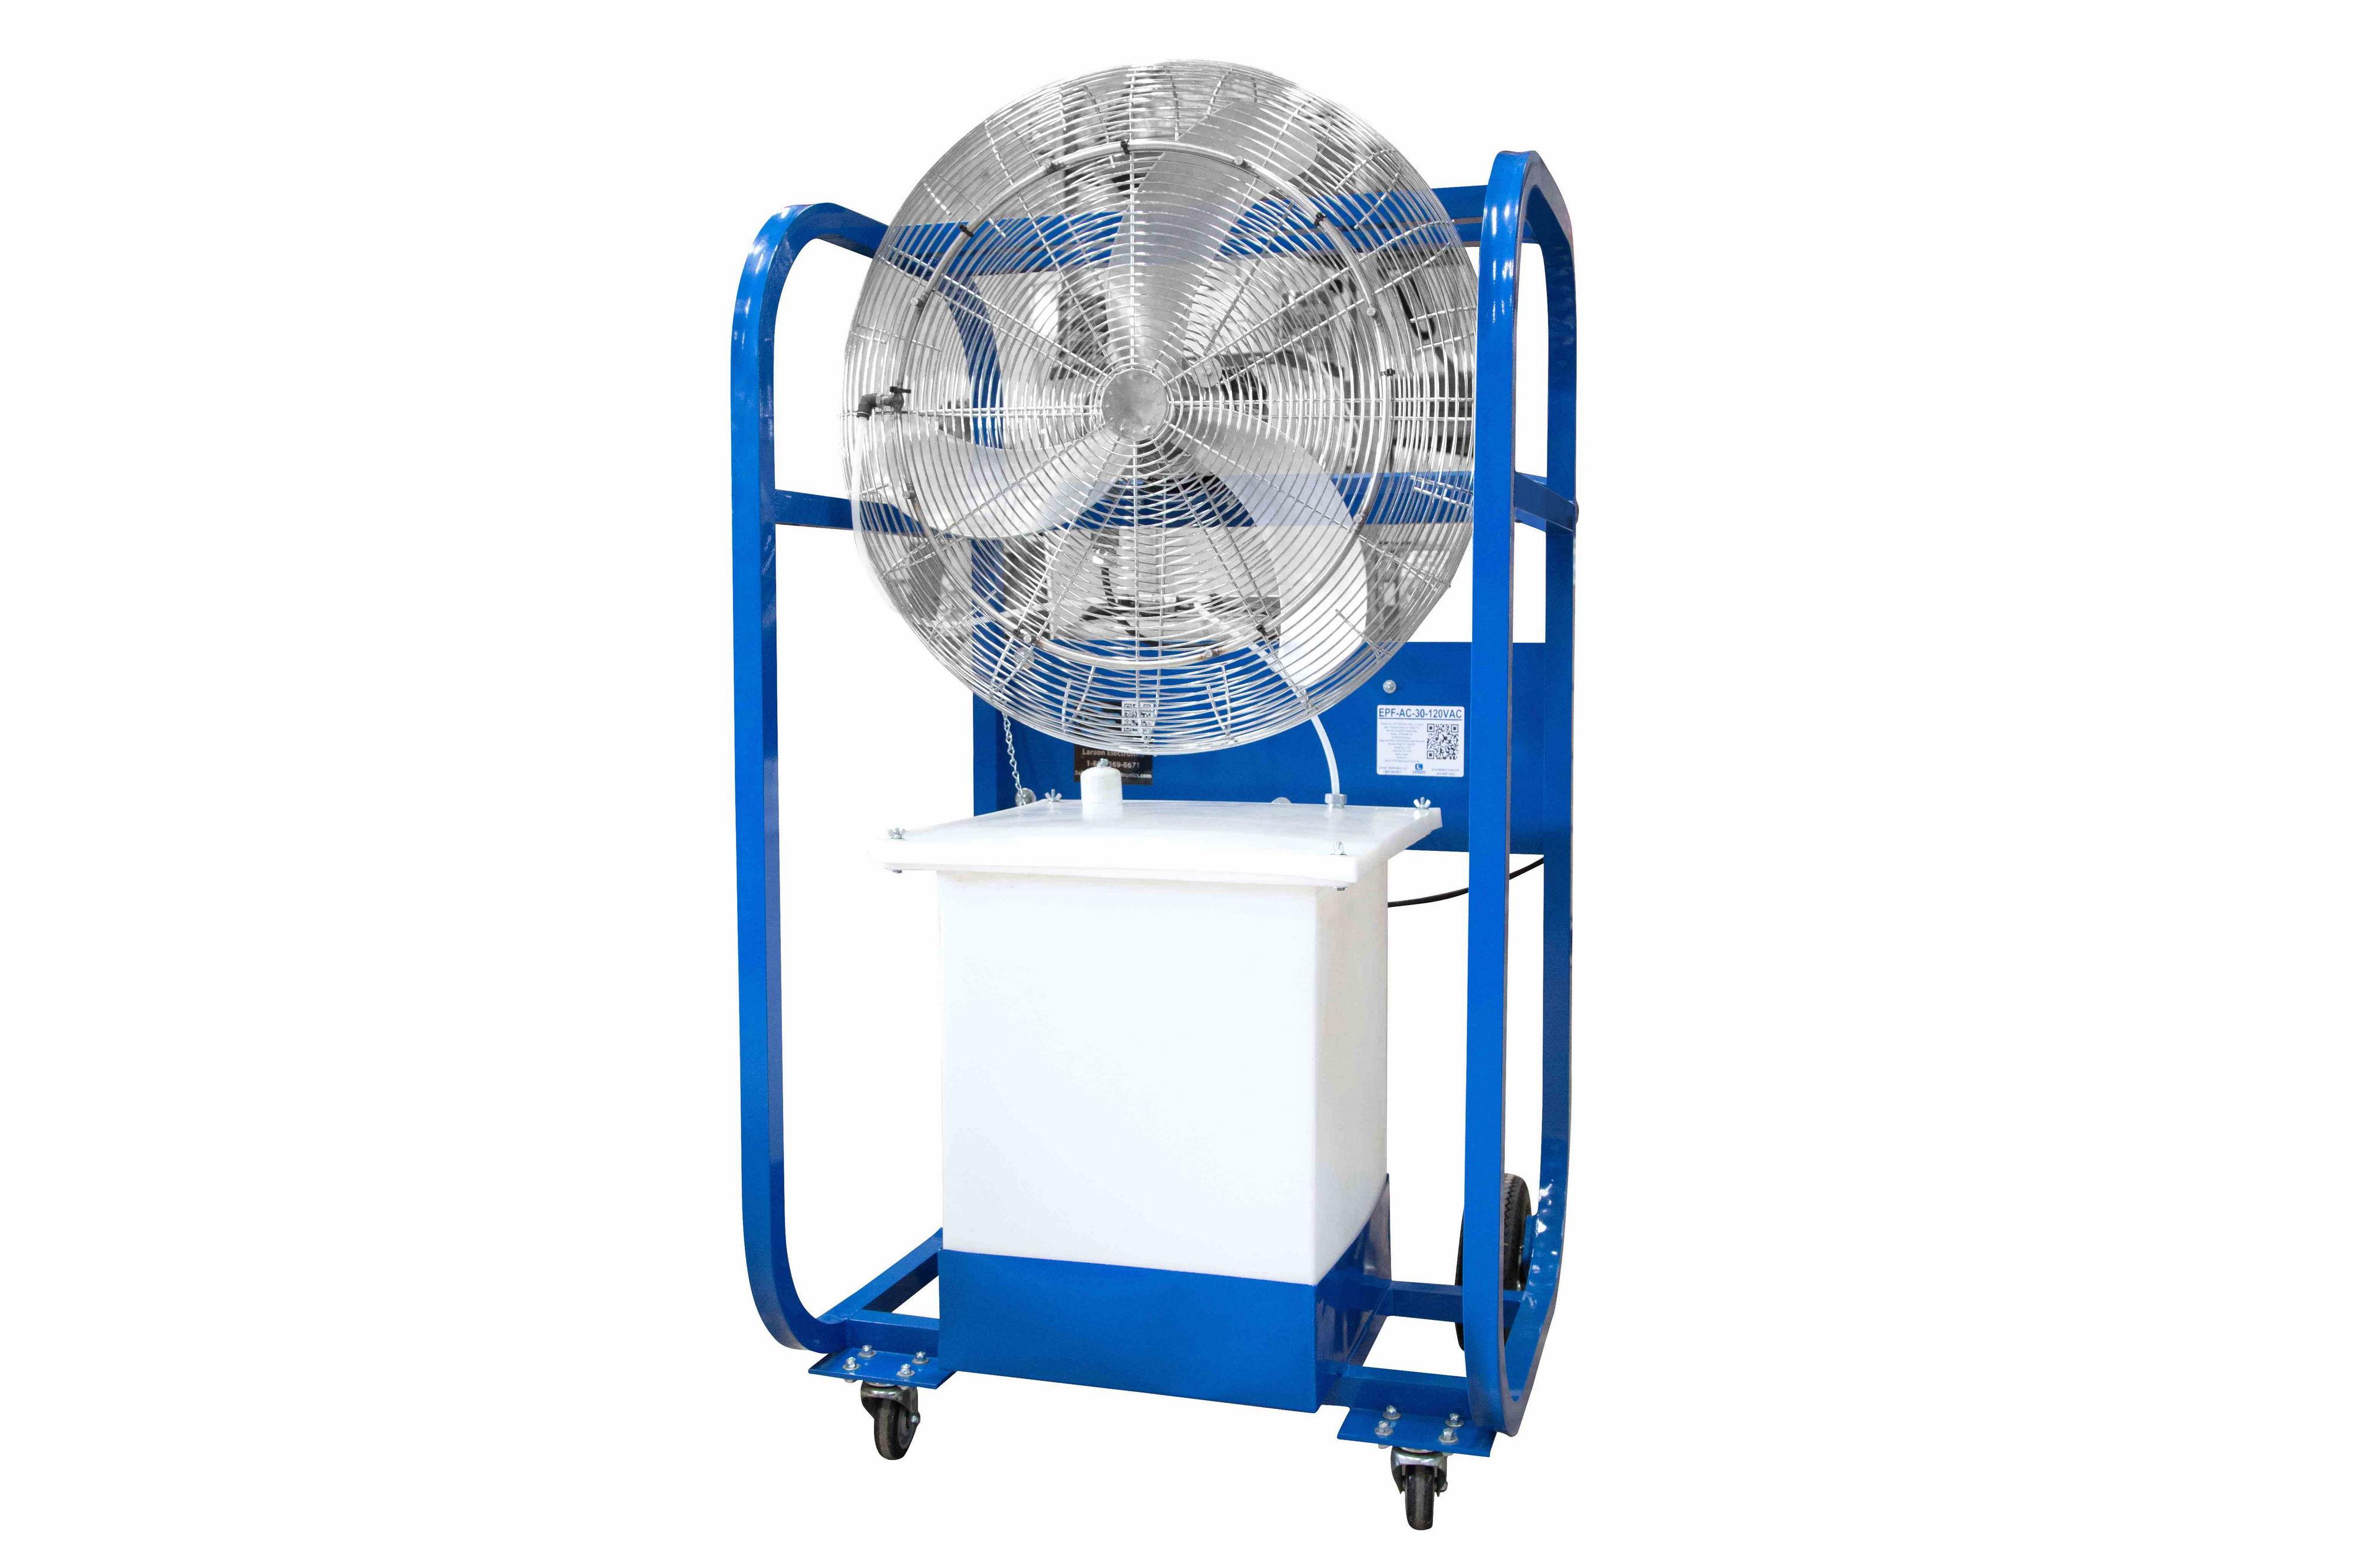 explosion proof portable evaporative cooler 24 od 8723 cfm 34